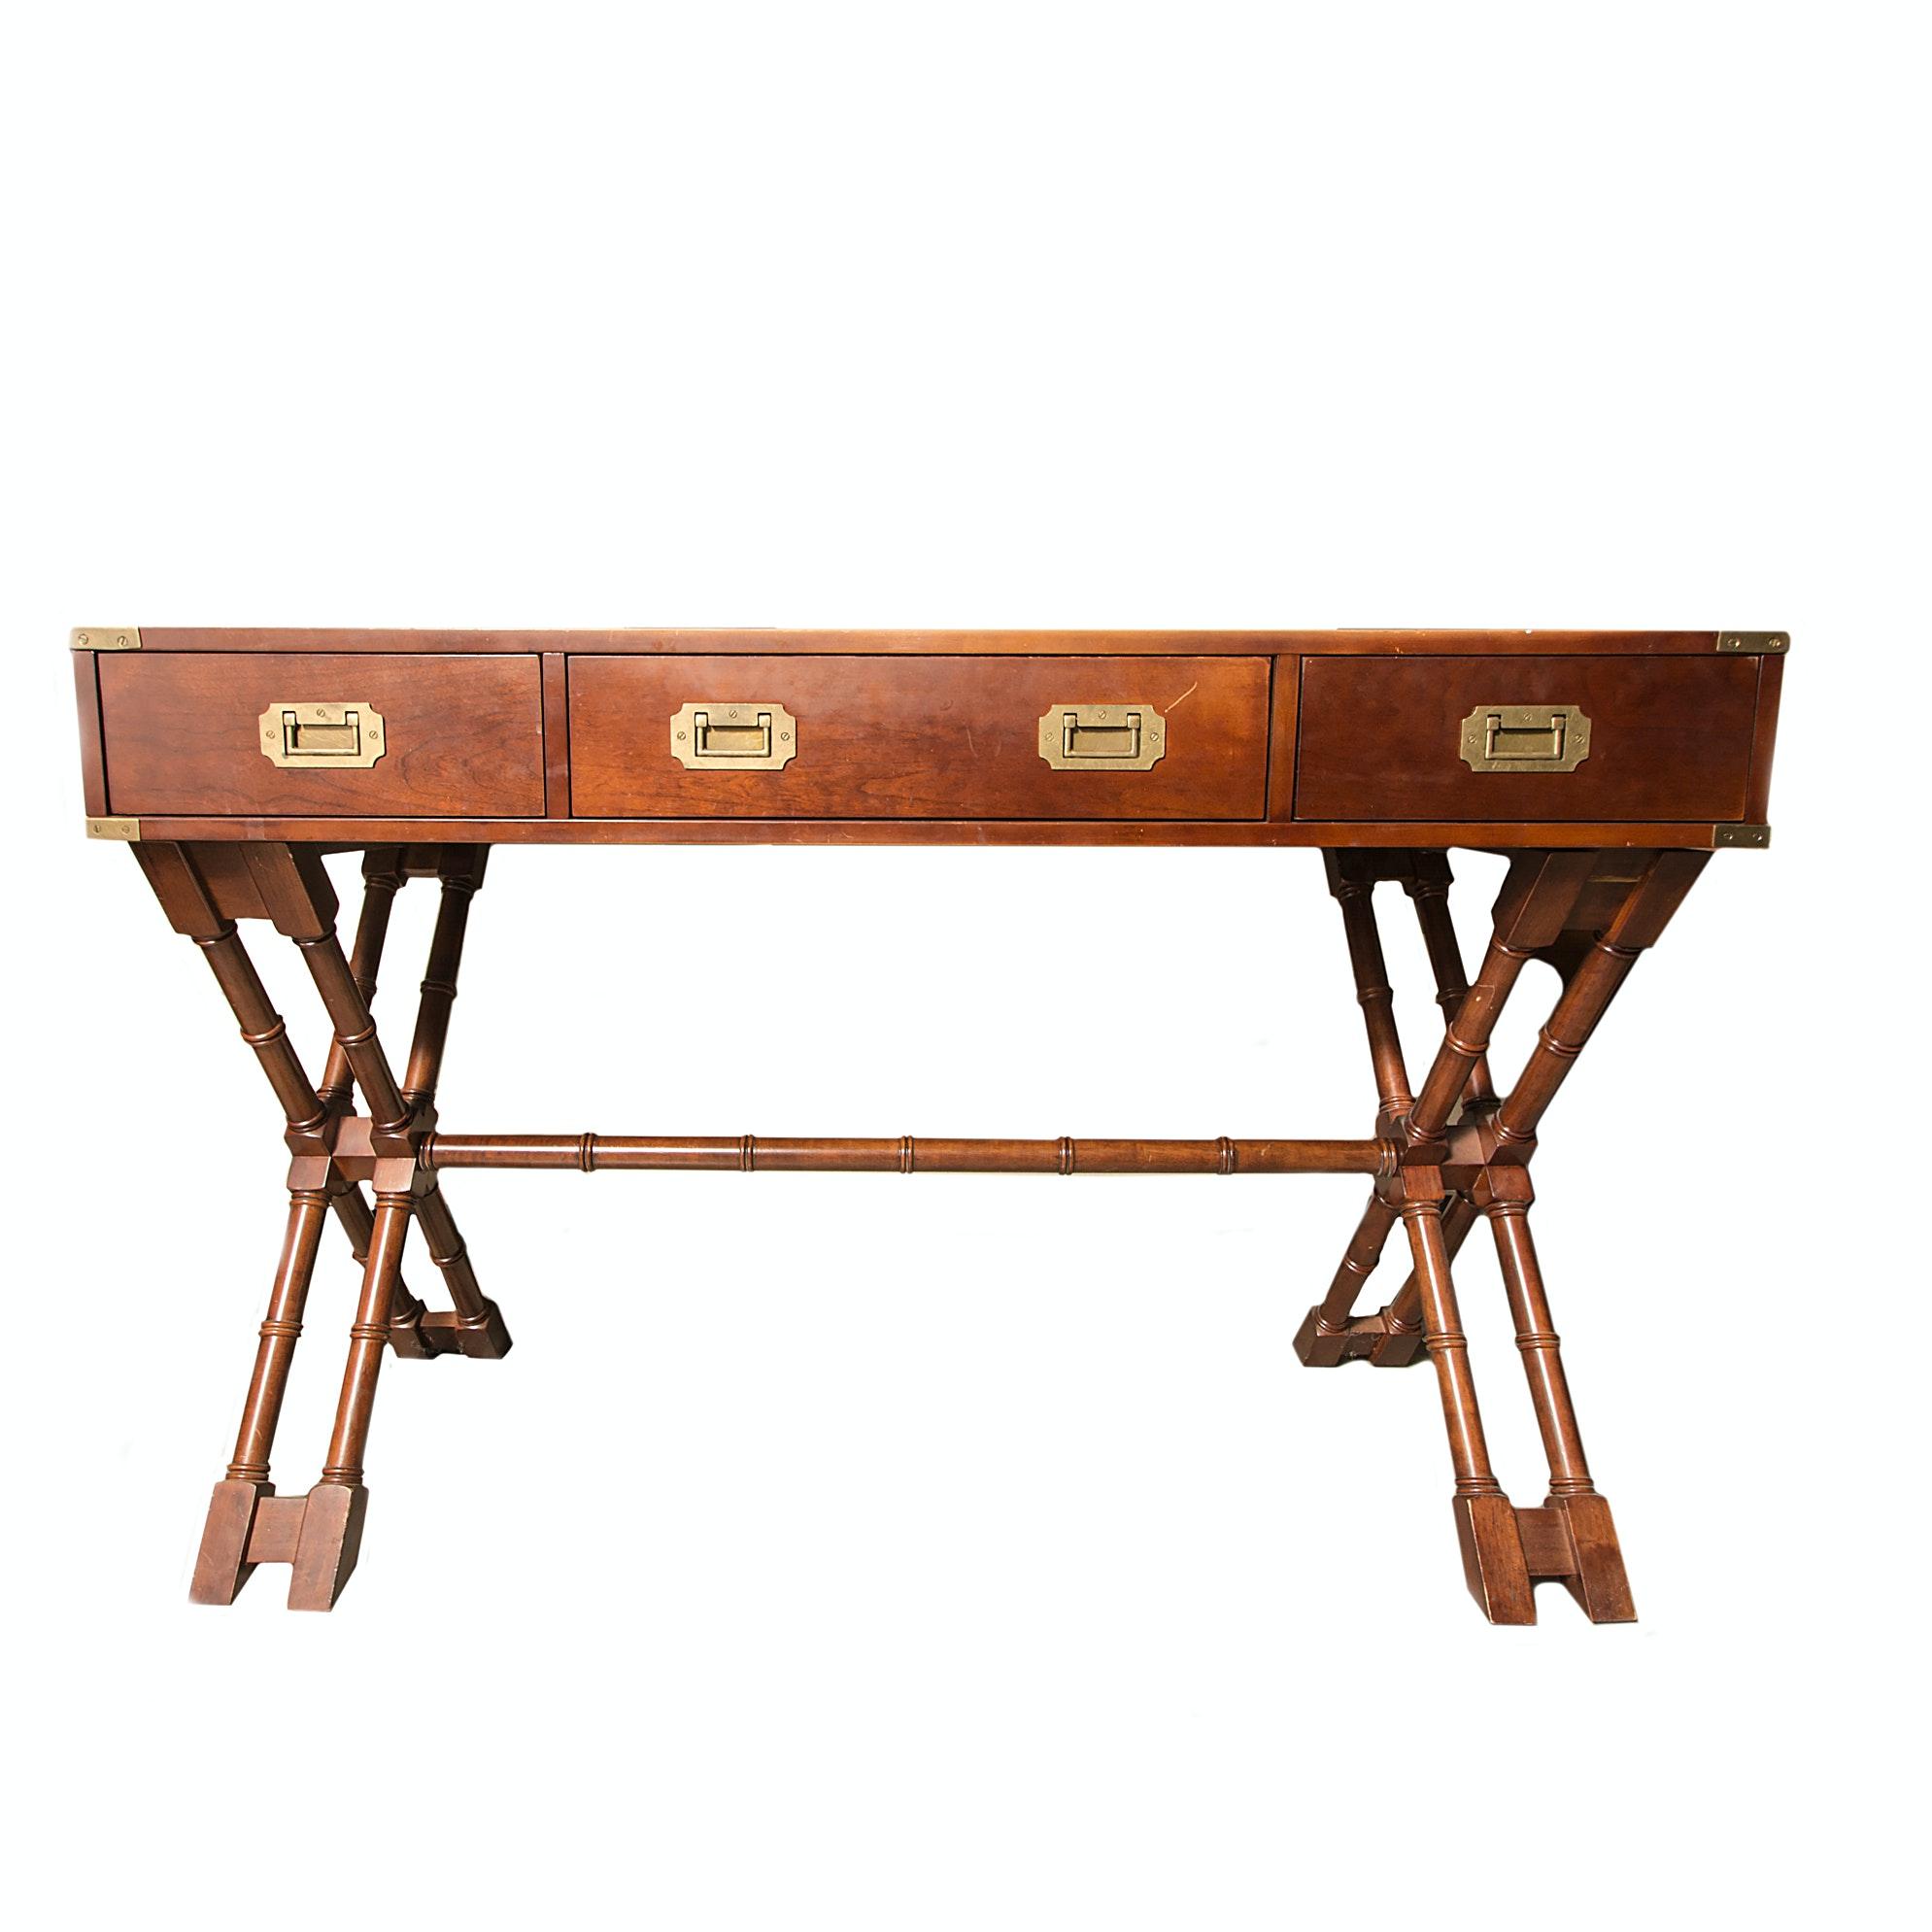 the bombay company campaign style desk ebth rh ebth com campaign style desk for sale campaign style desk for sale